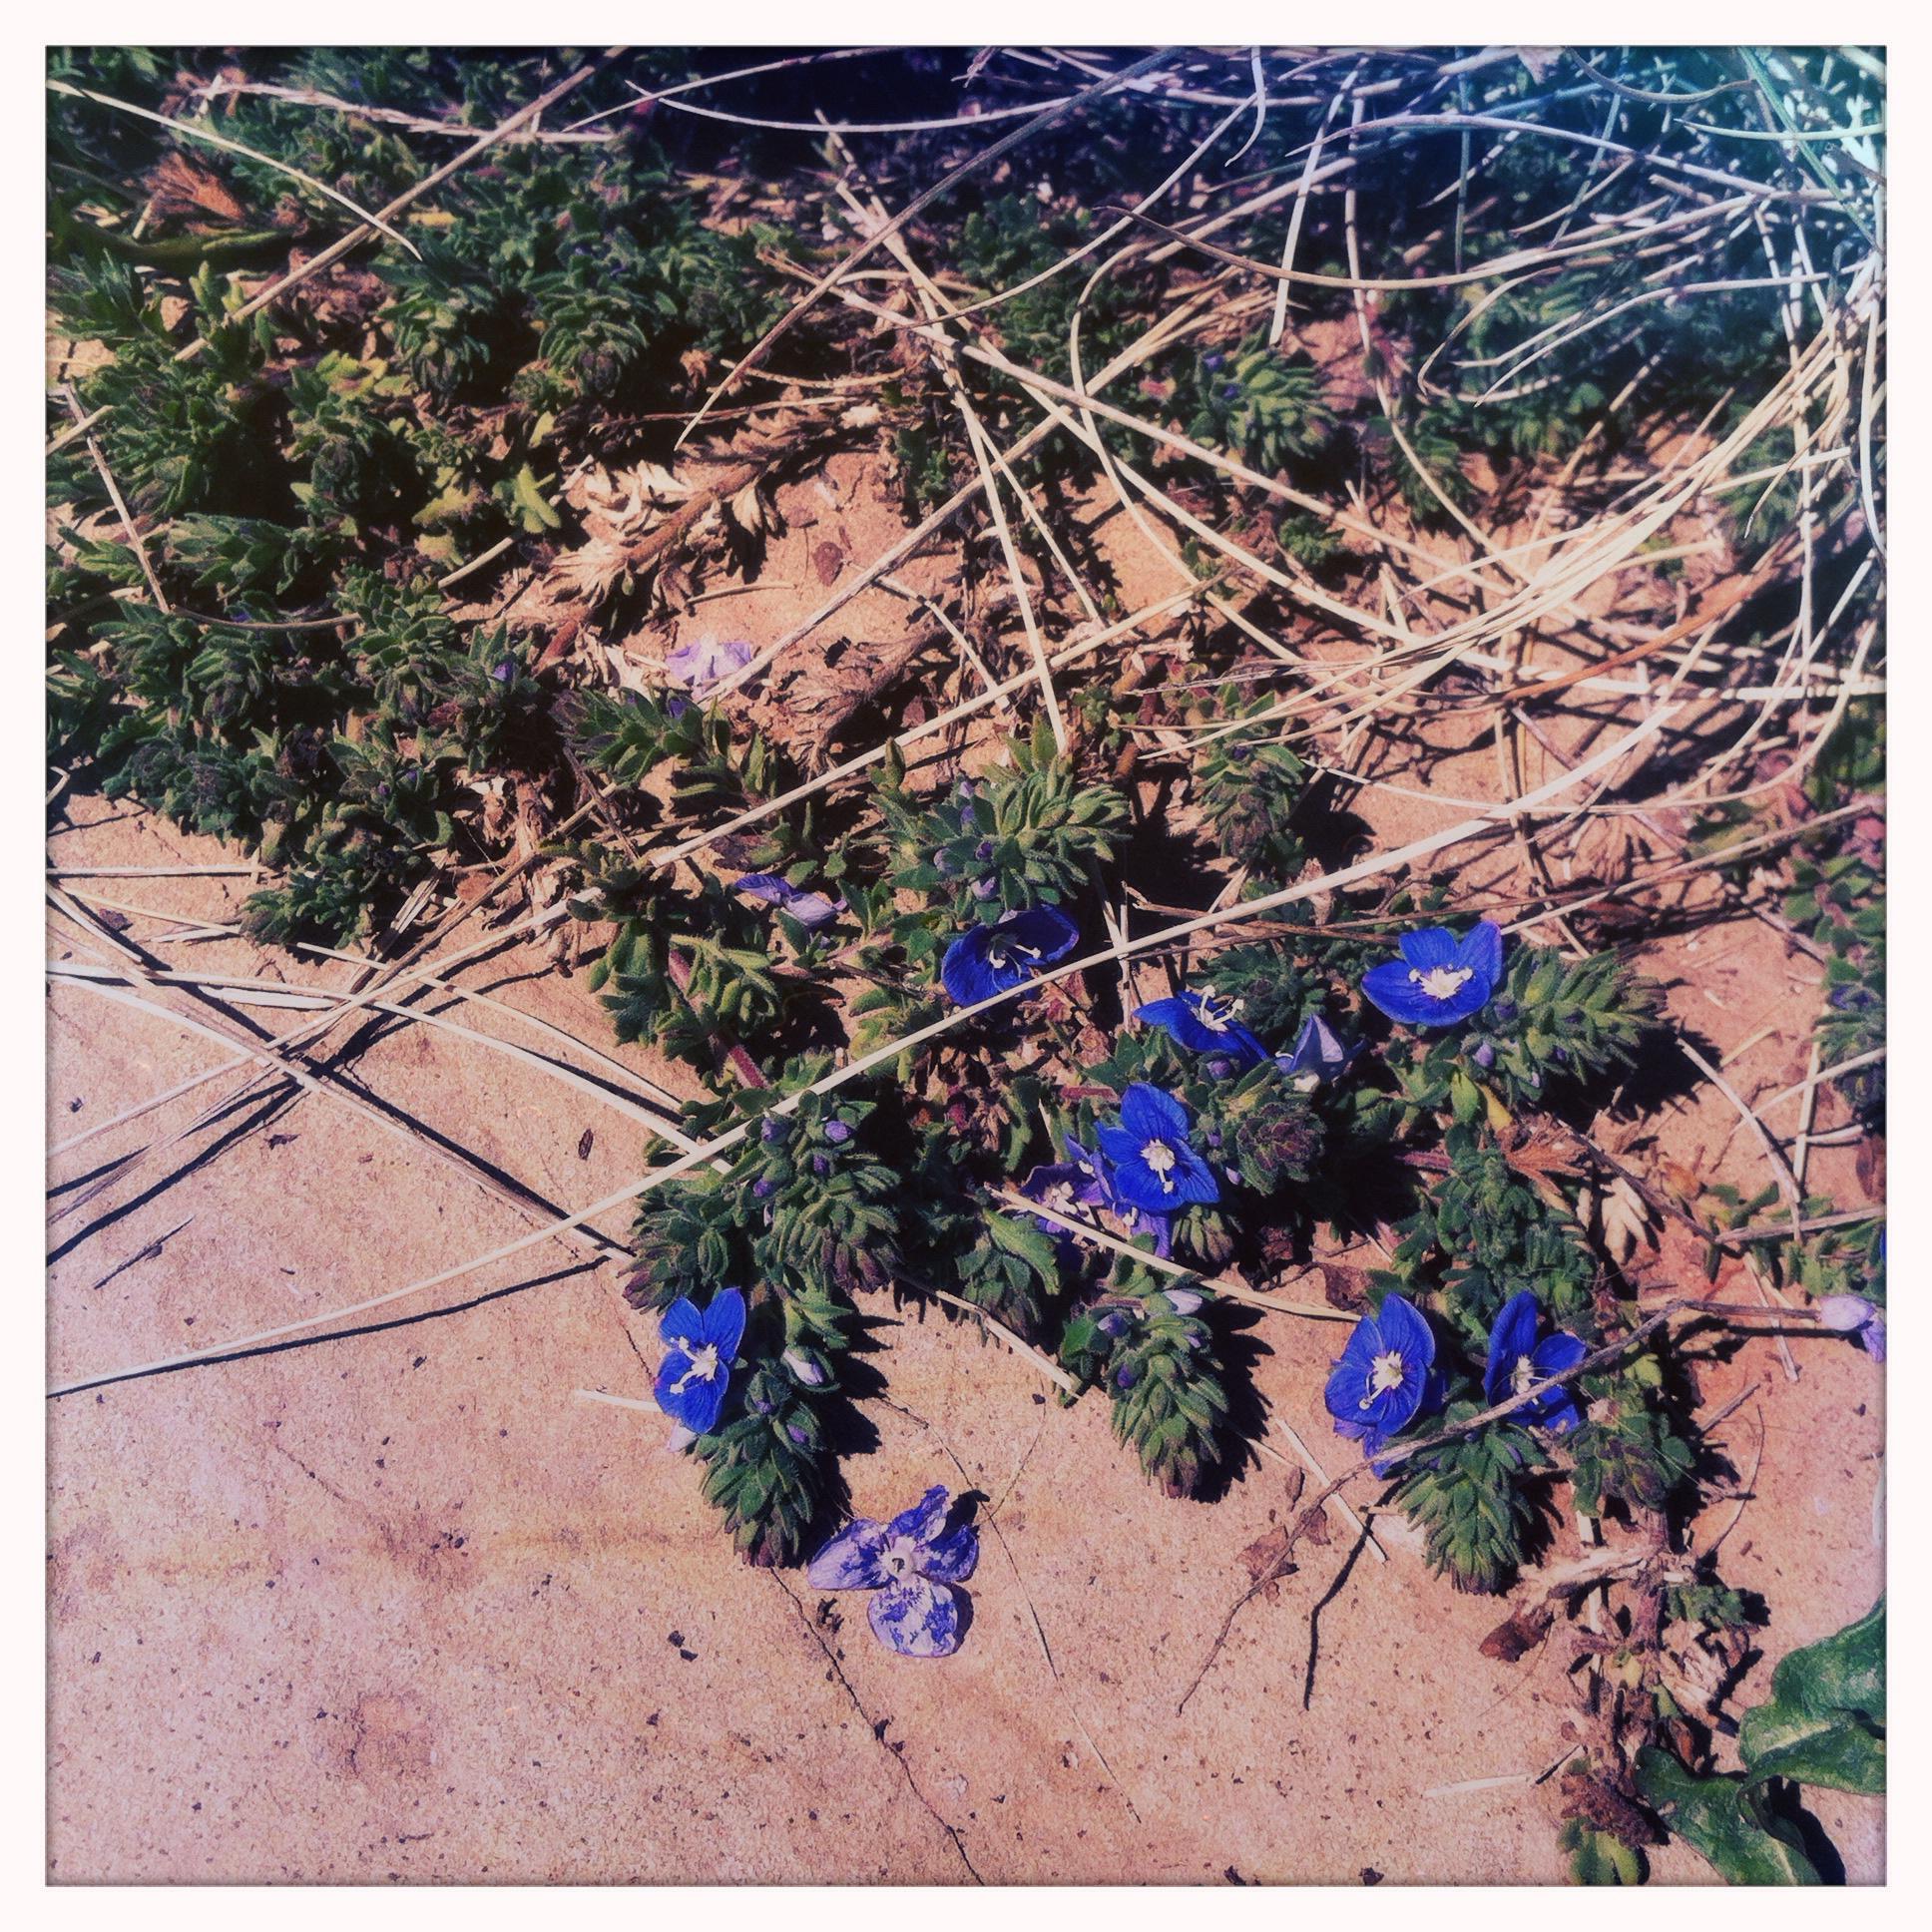 Blooming Veronica creeps across a sandstone slab.